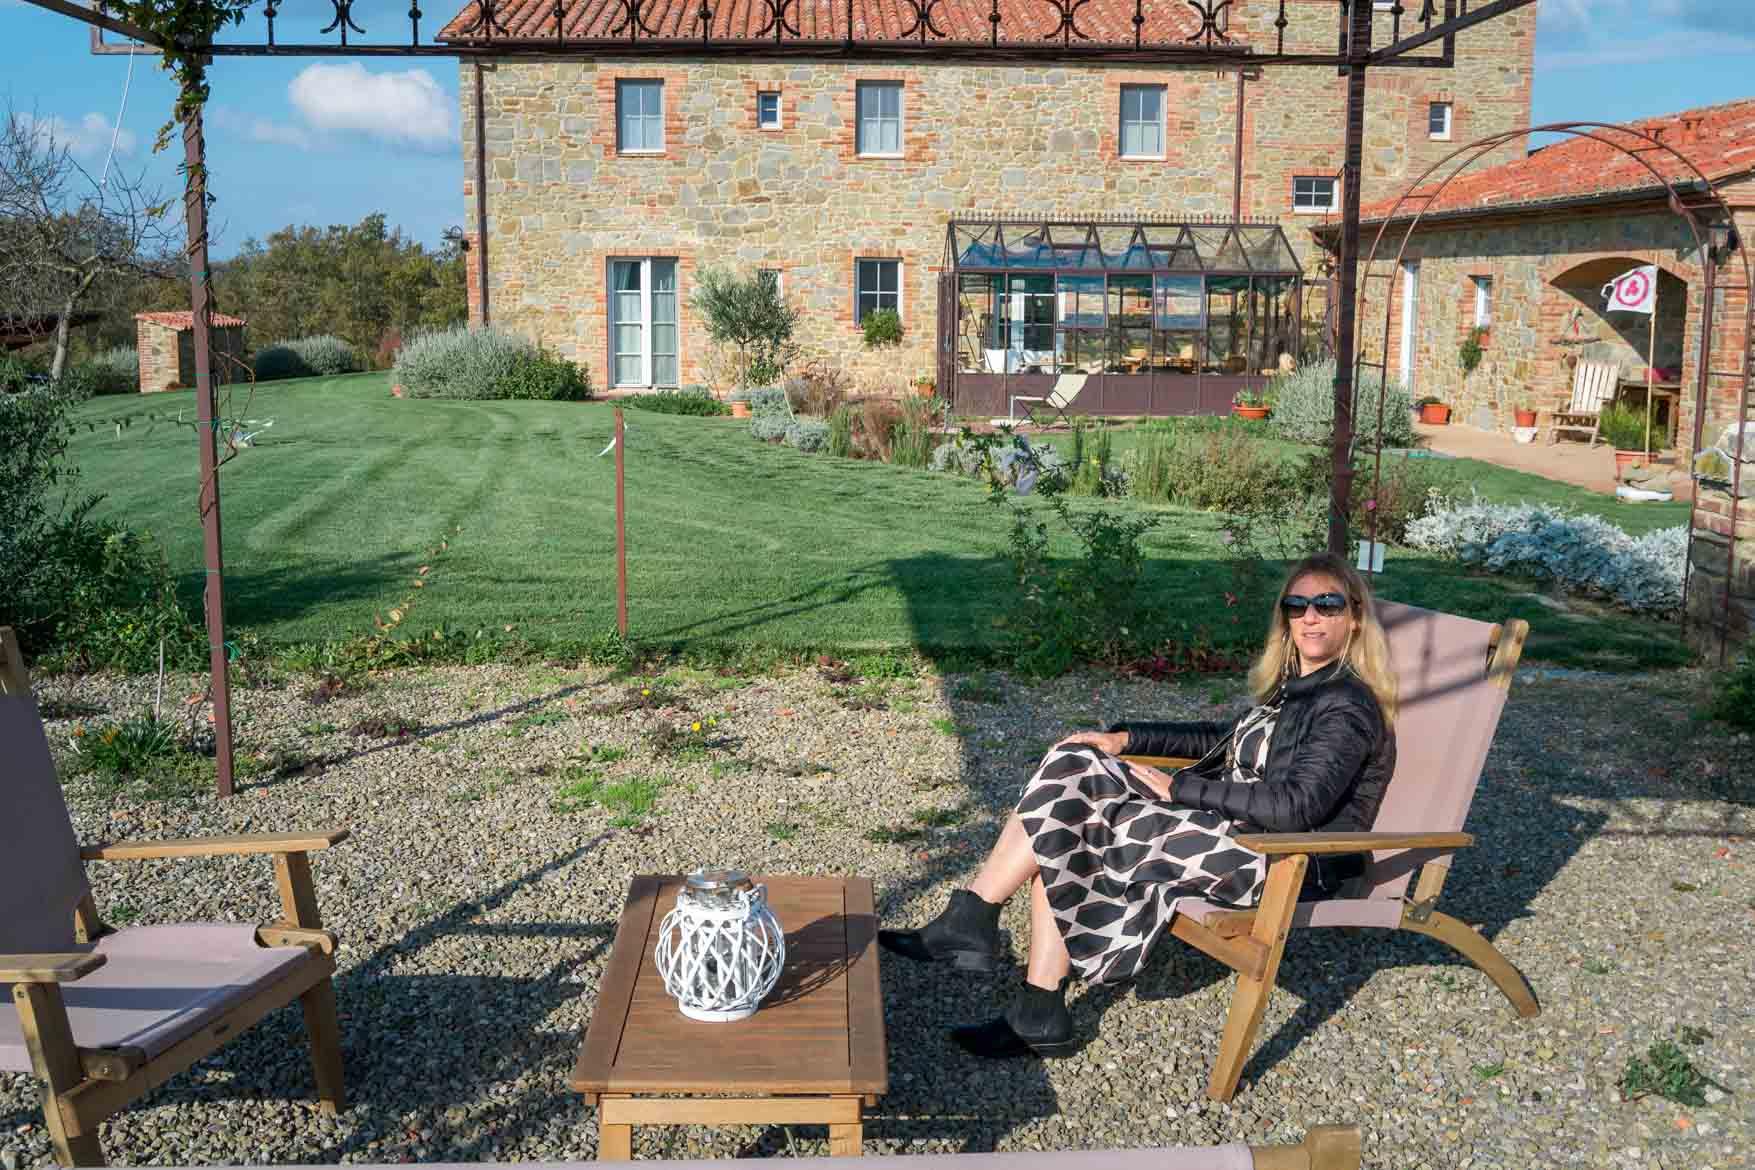 Casa Antheia giardino - In viaggio con Monica